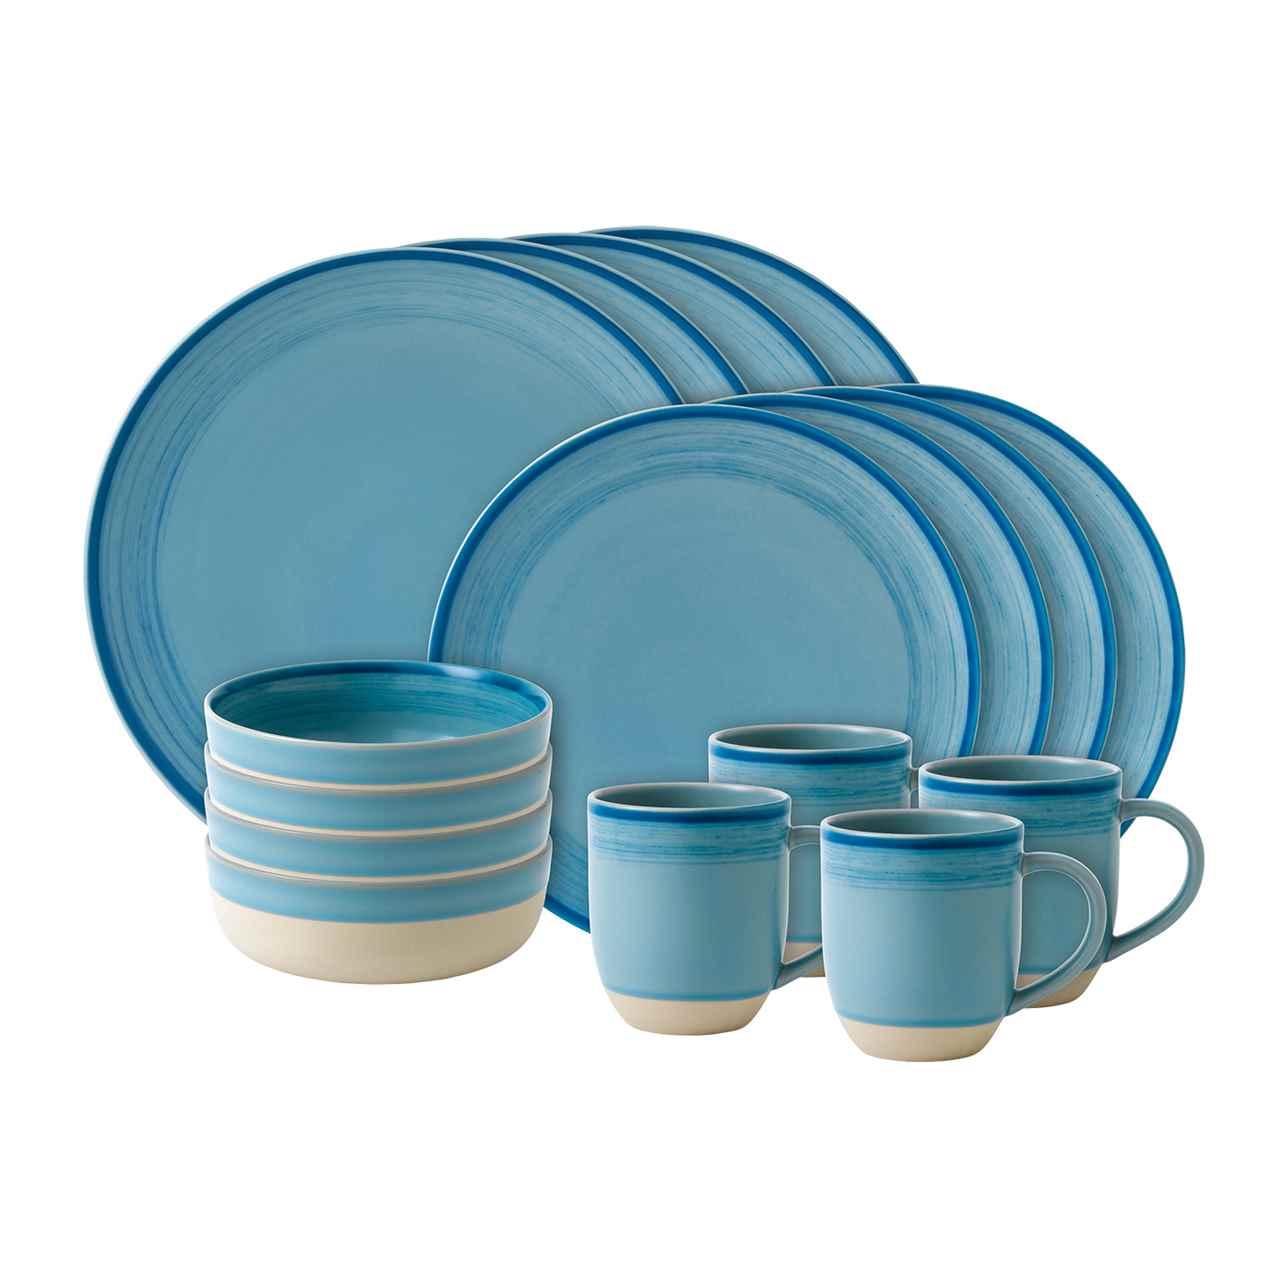 ED Brushed Glaze Polar Blue 16 Piece Dinner Set